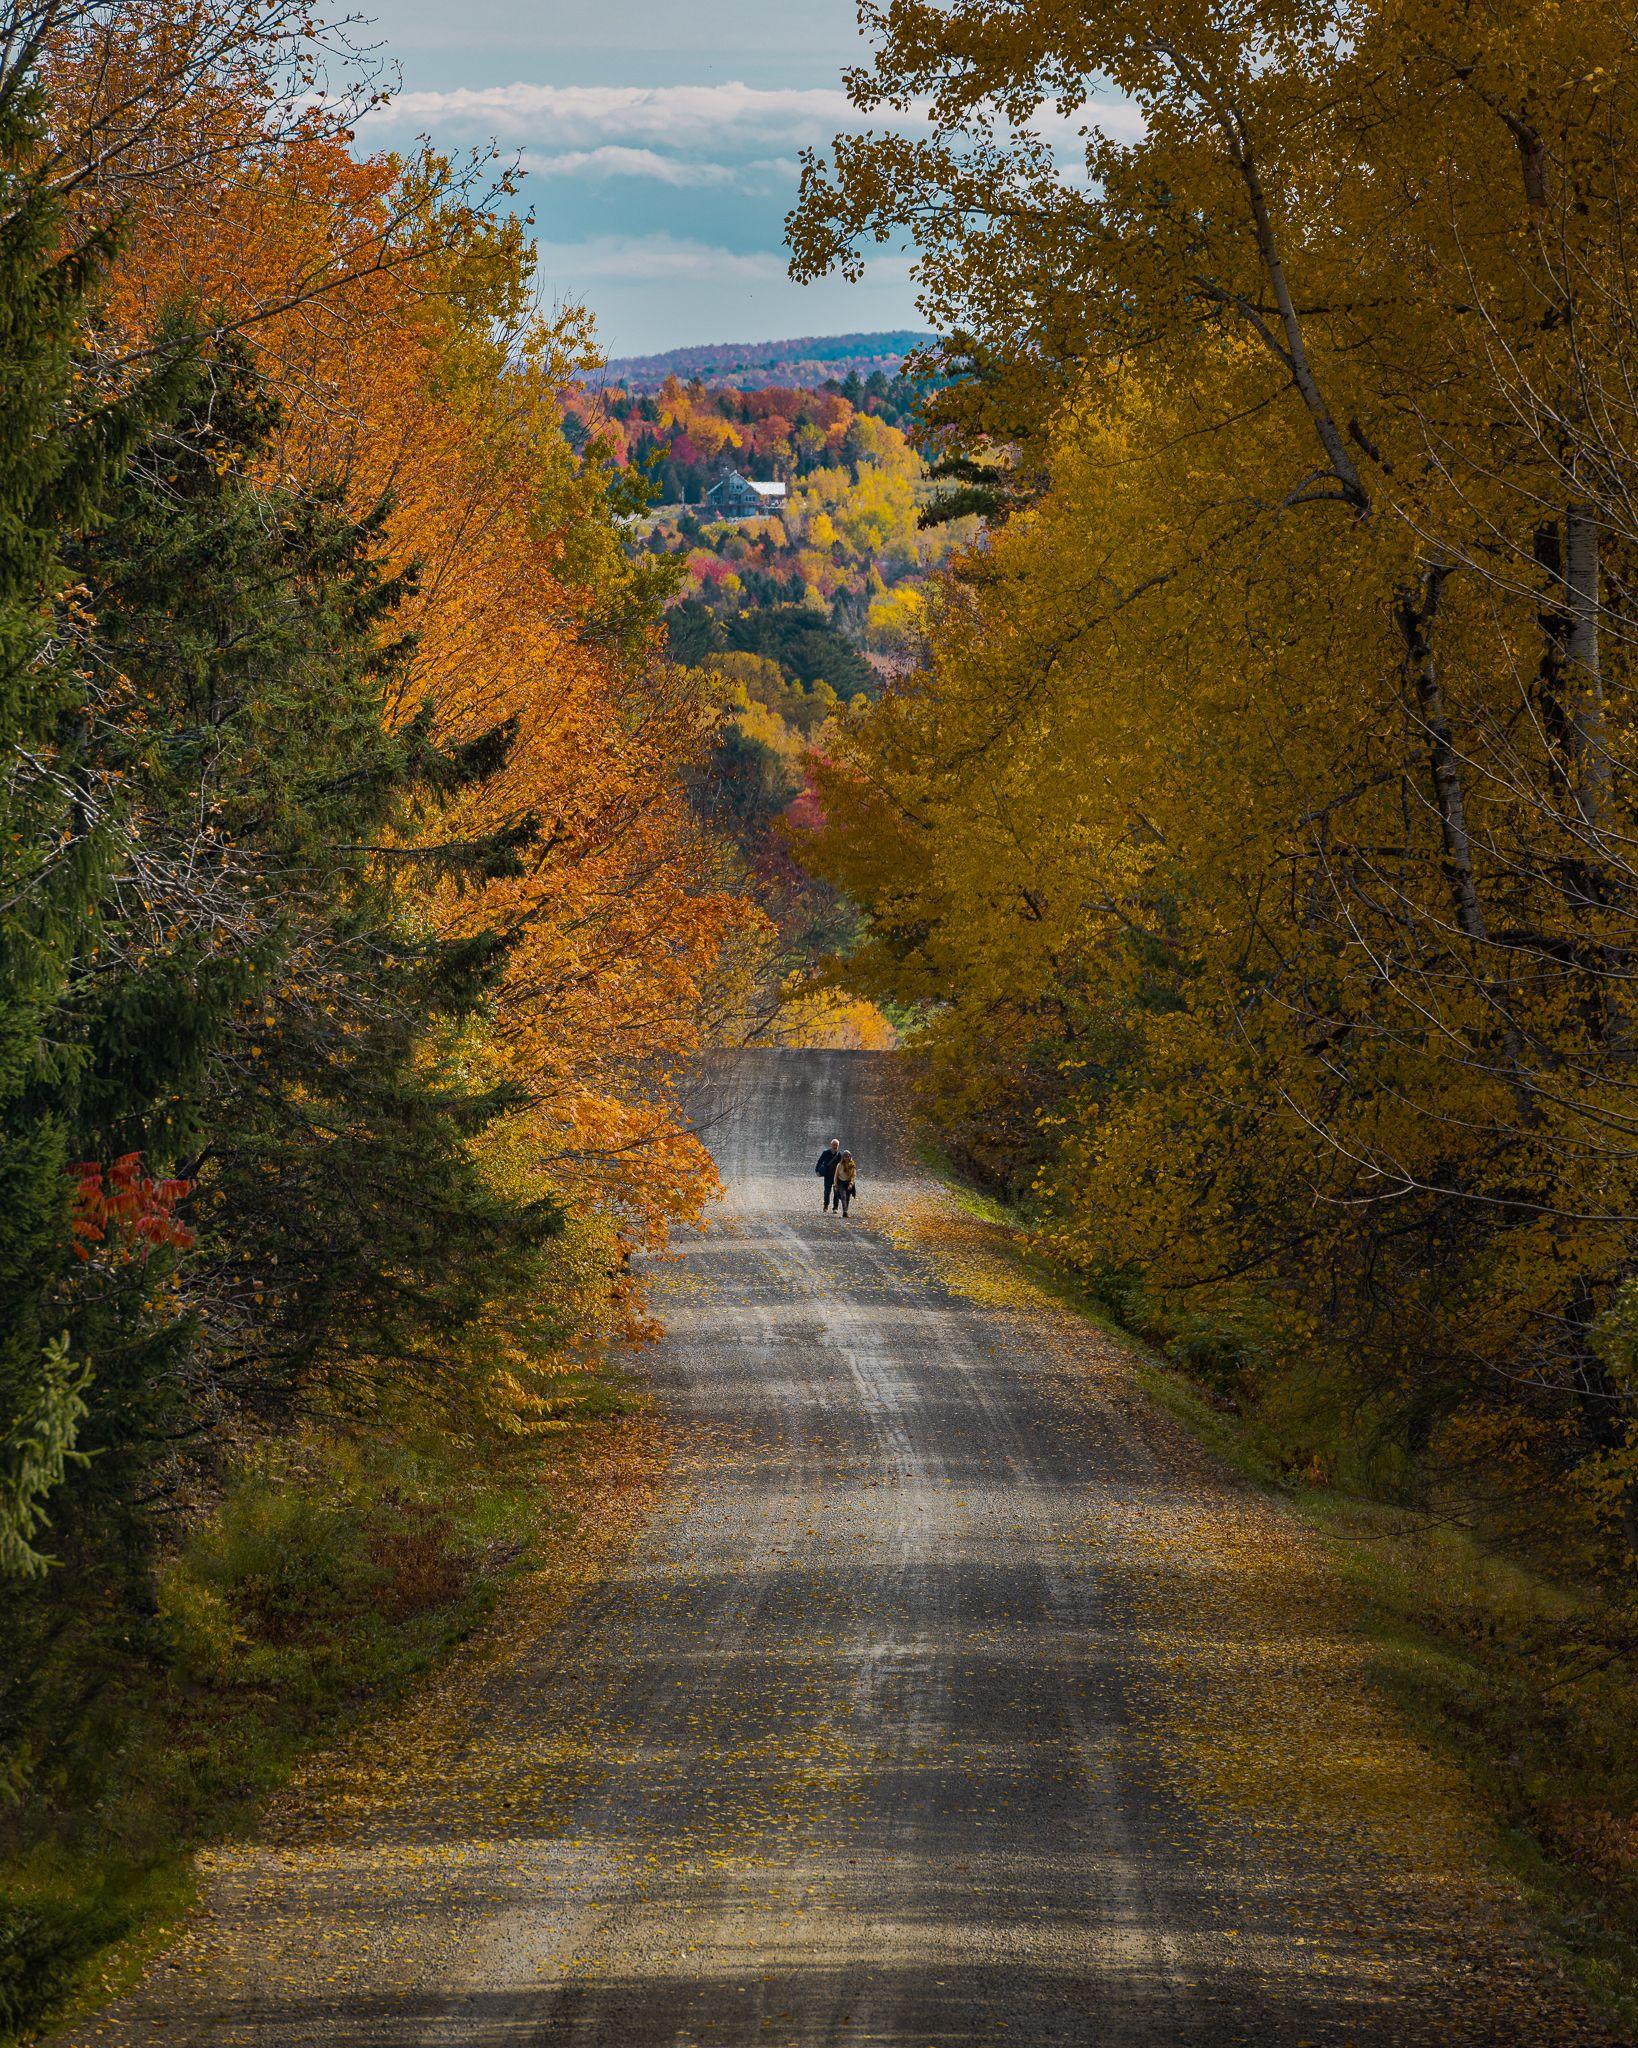 Automne au Québec